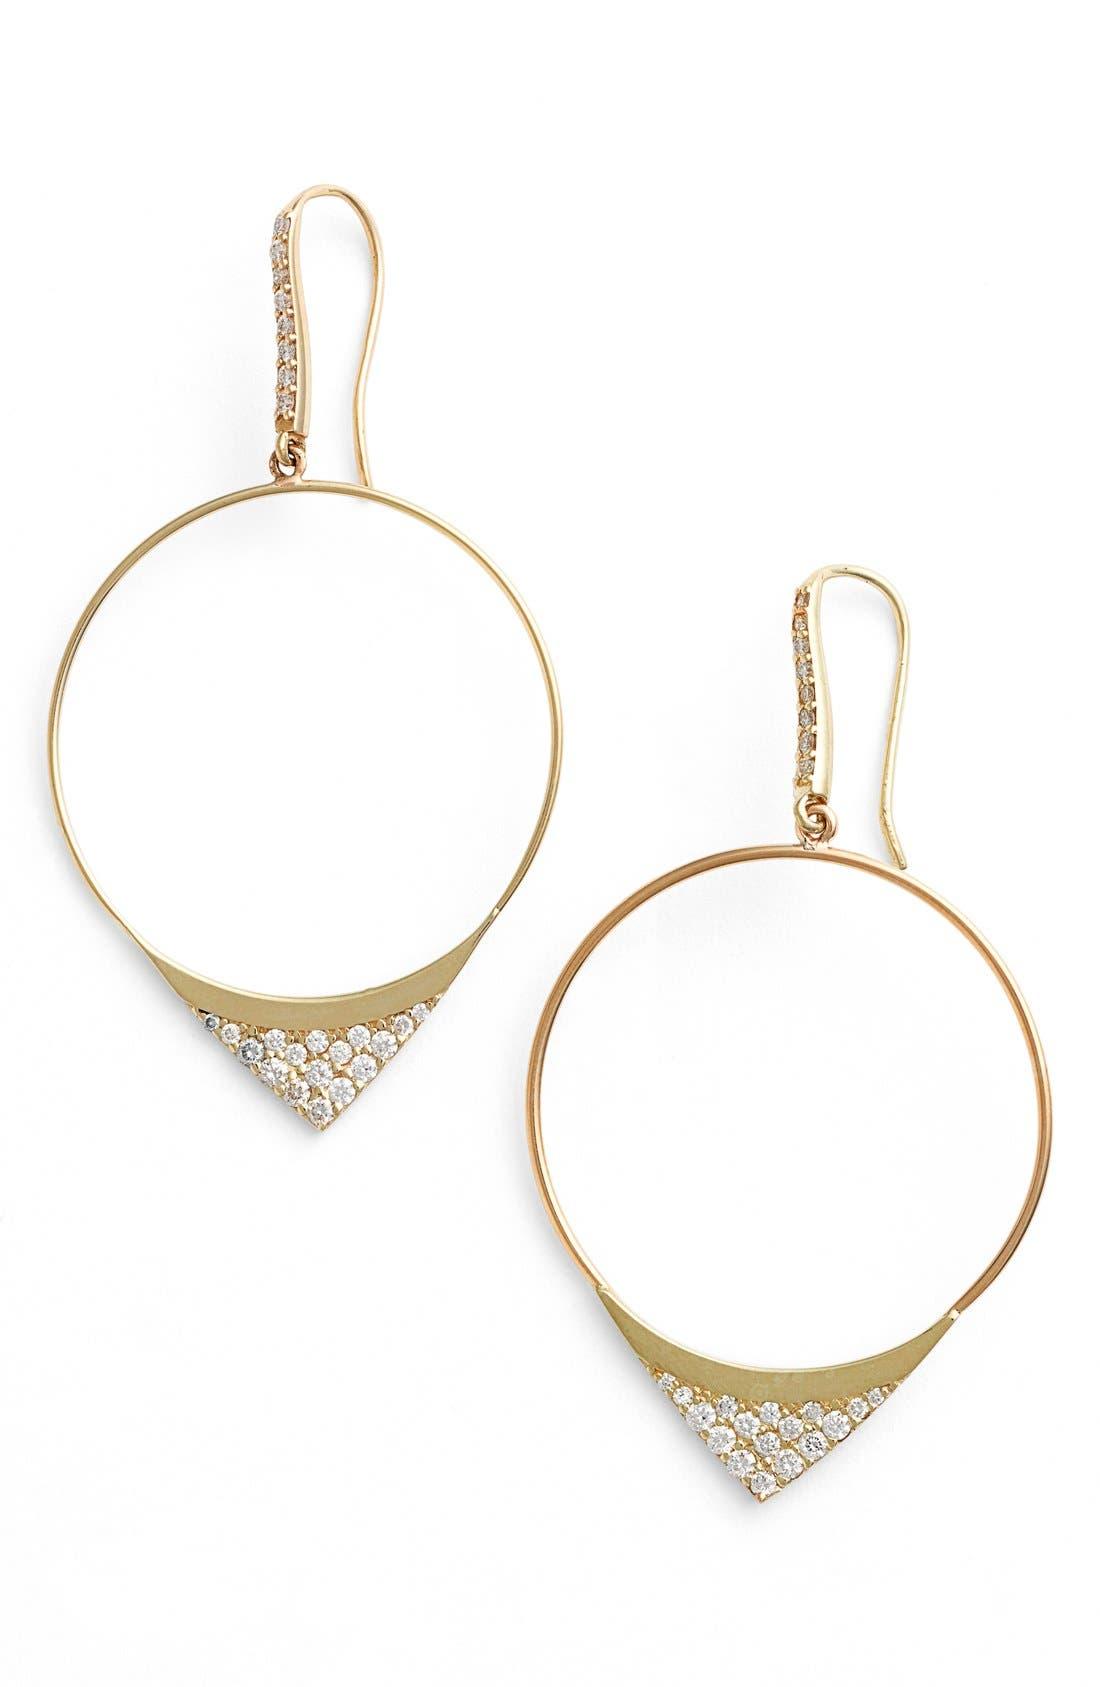 Main Image - Lana Jewelry 'Elite - Electric Flawless' Small Hoop Drop Earrings